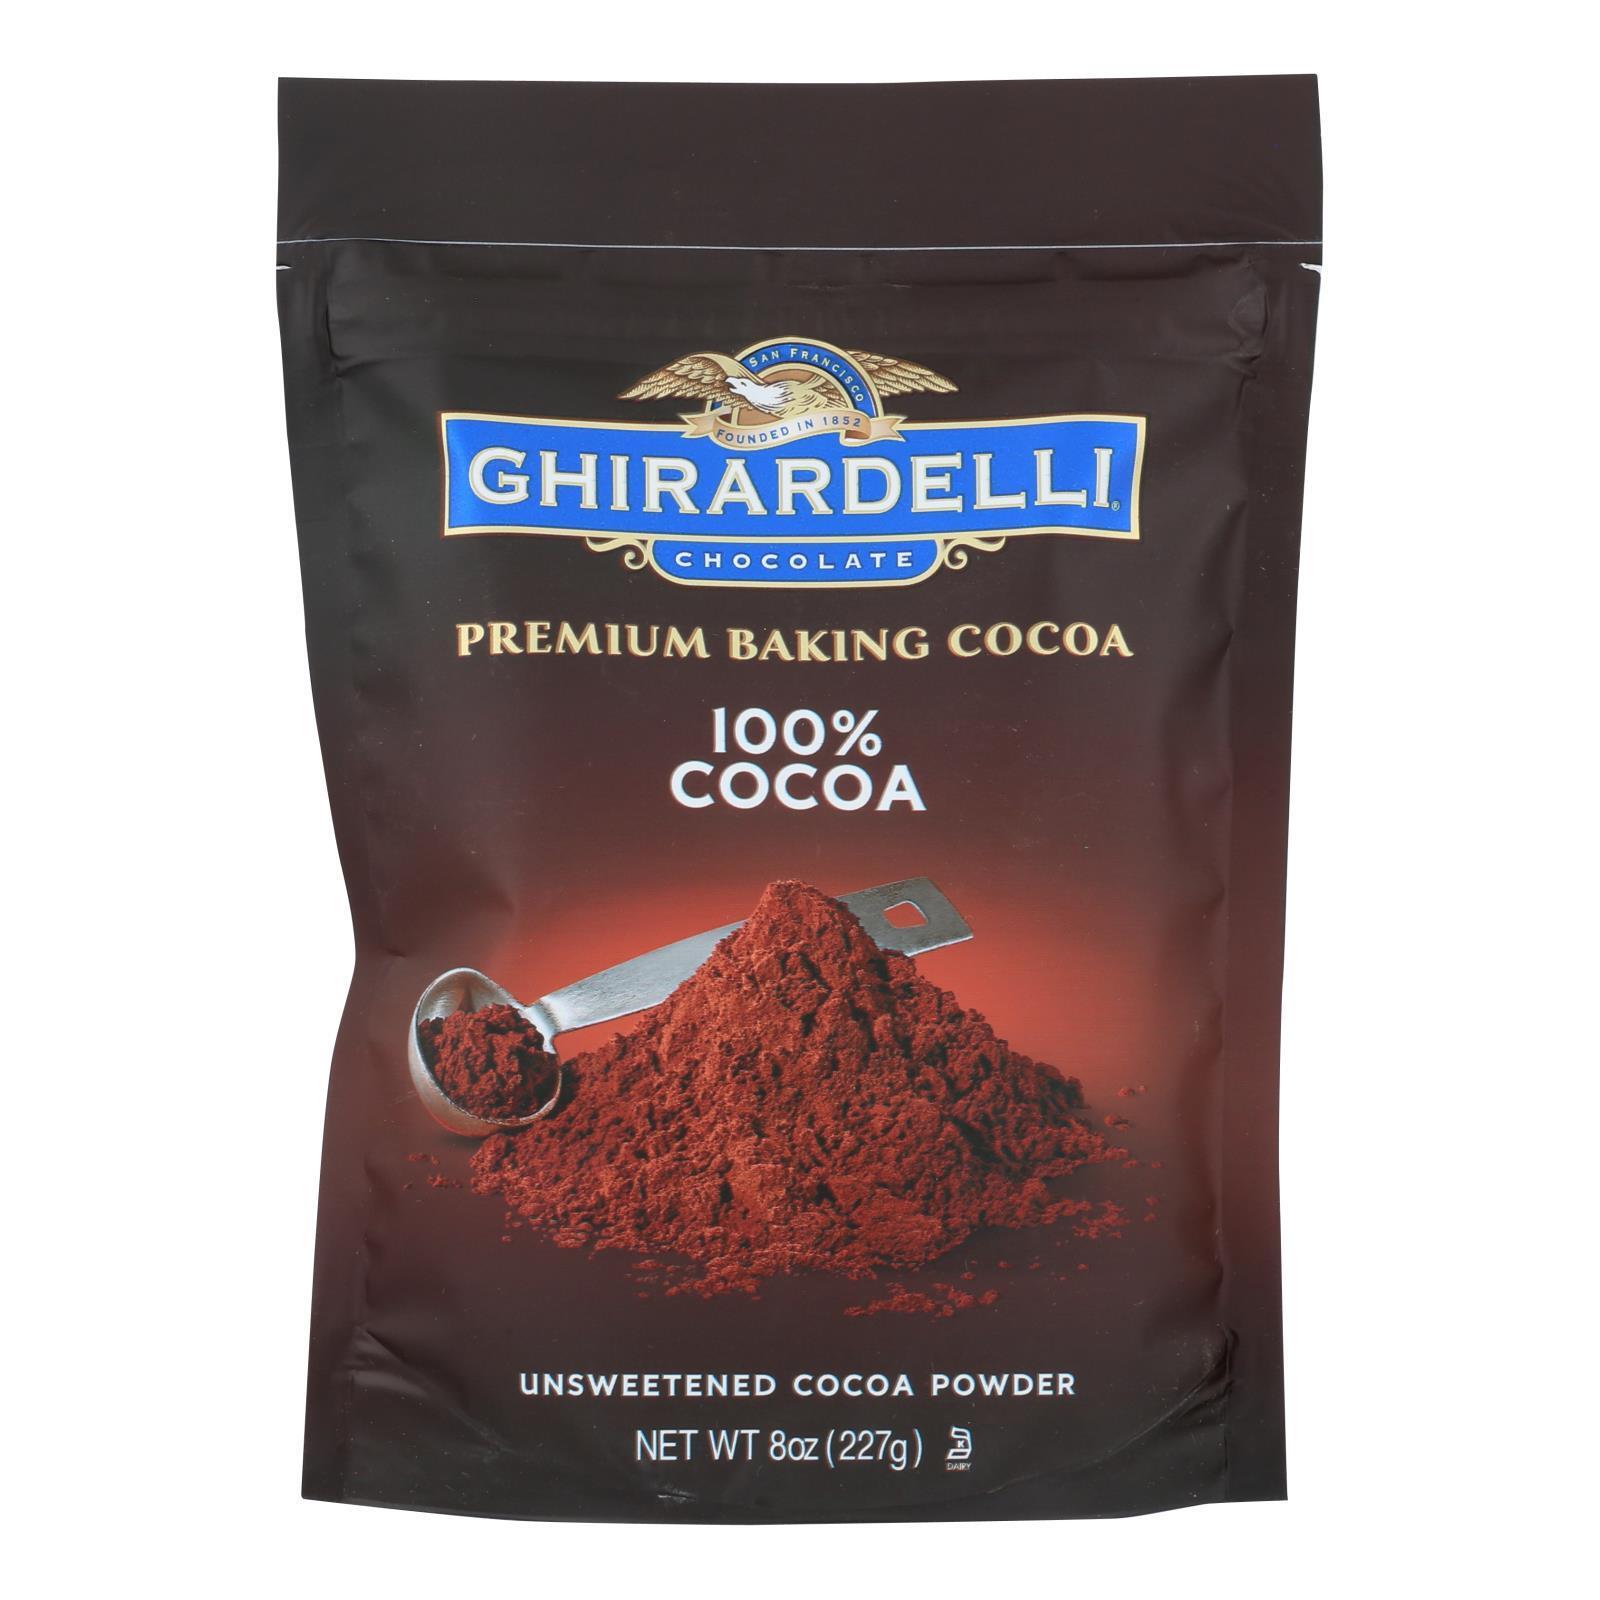 Ghirardelli Baking Cocoa - Premium - 100 Percent Unsweetened - 8 oz - case of 6